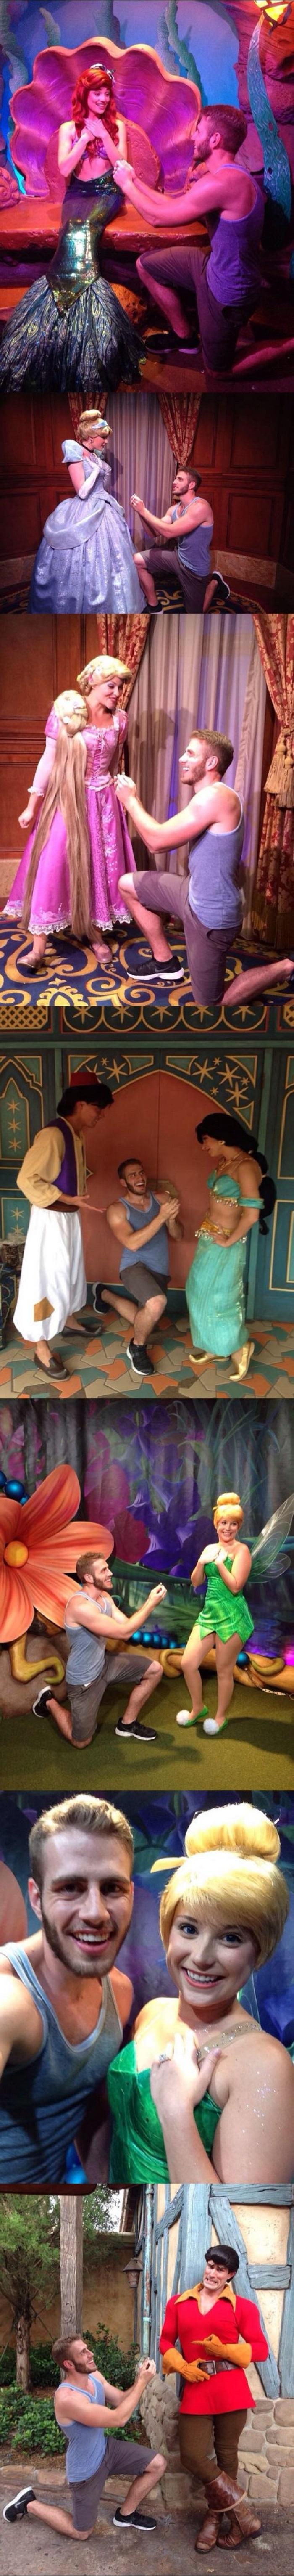 Proposing to princesses